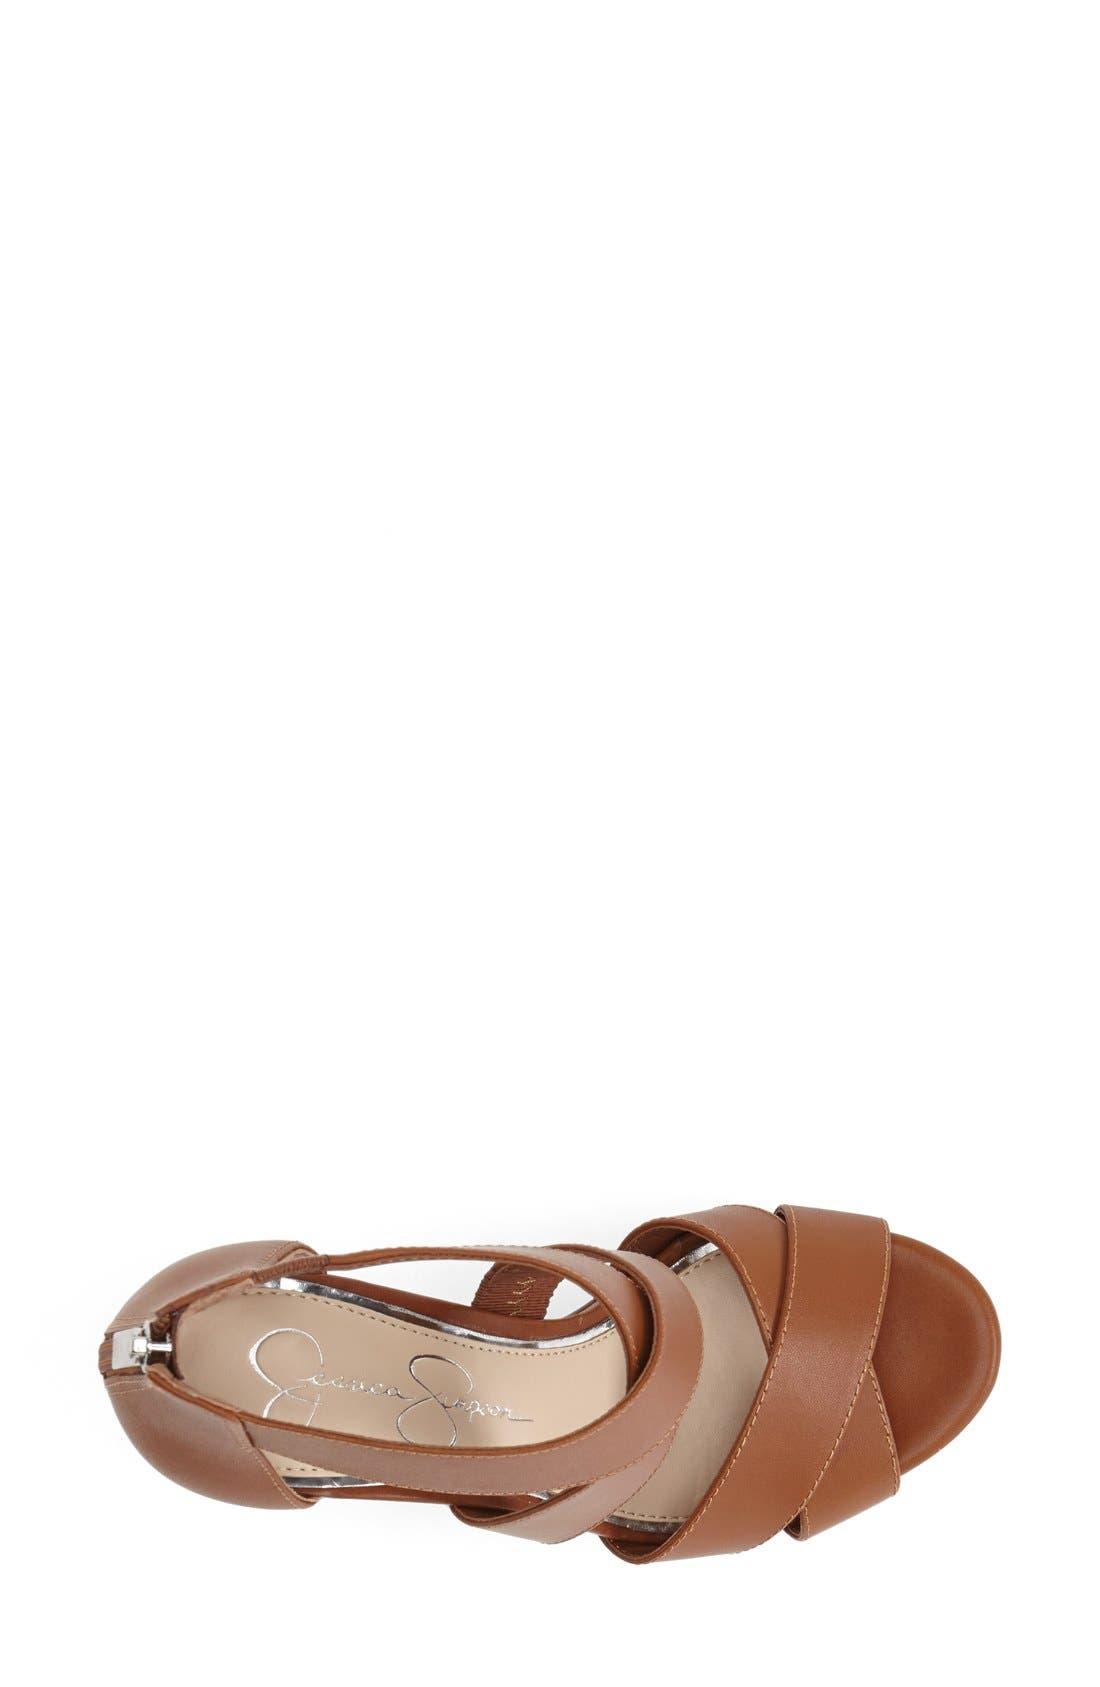 Alternate Image 3  - Jessica Simpson 'Jadyn' Strappy Wedge Sandal (Women)